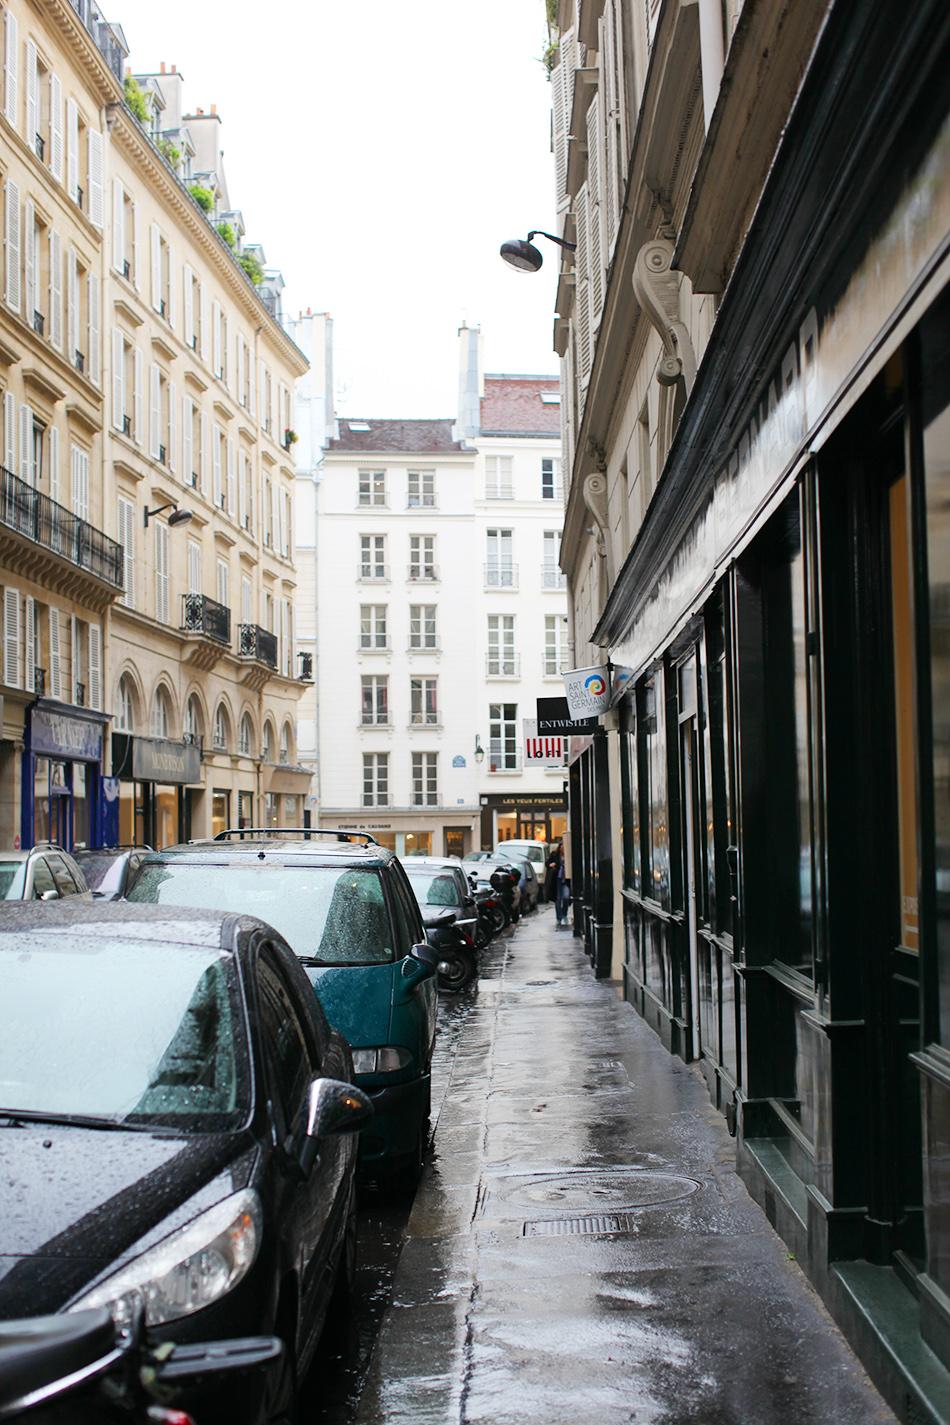 l'hotel paris, france street